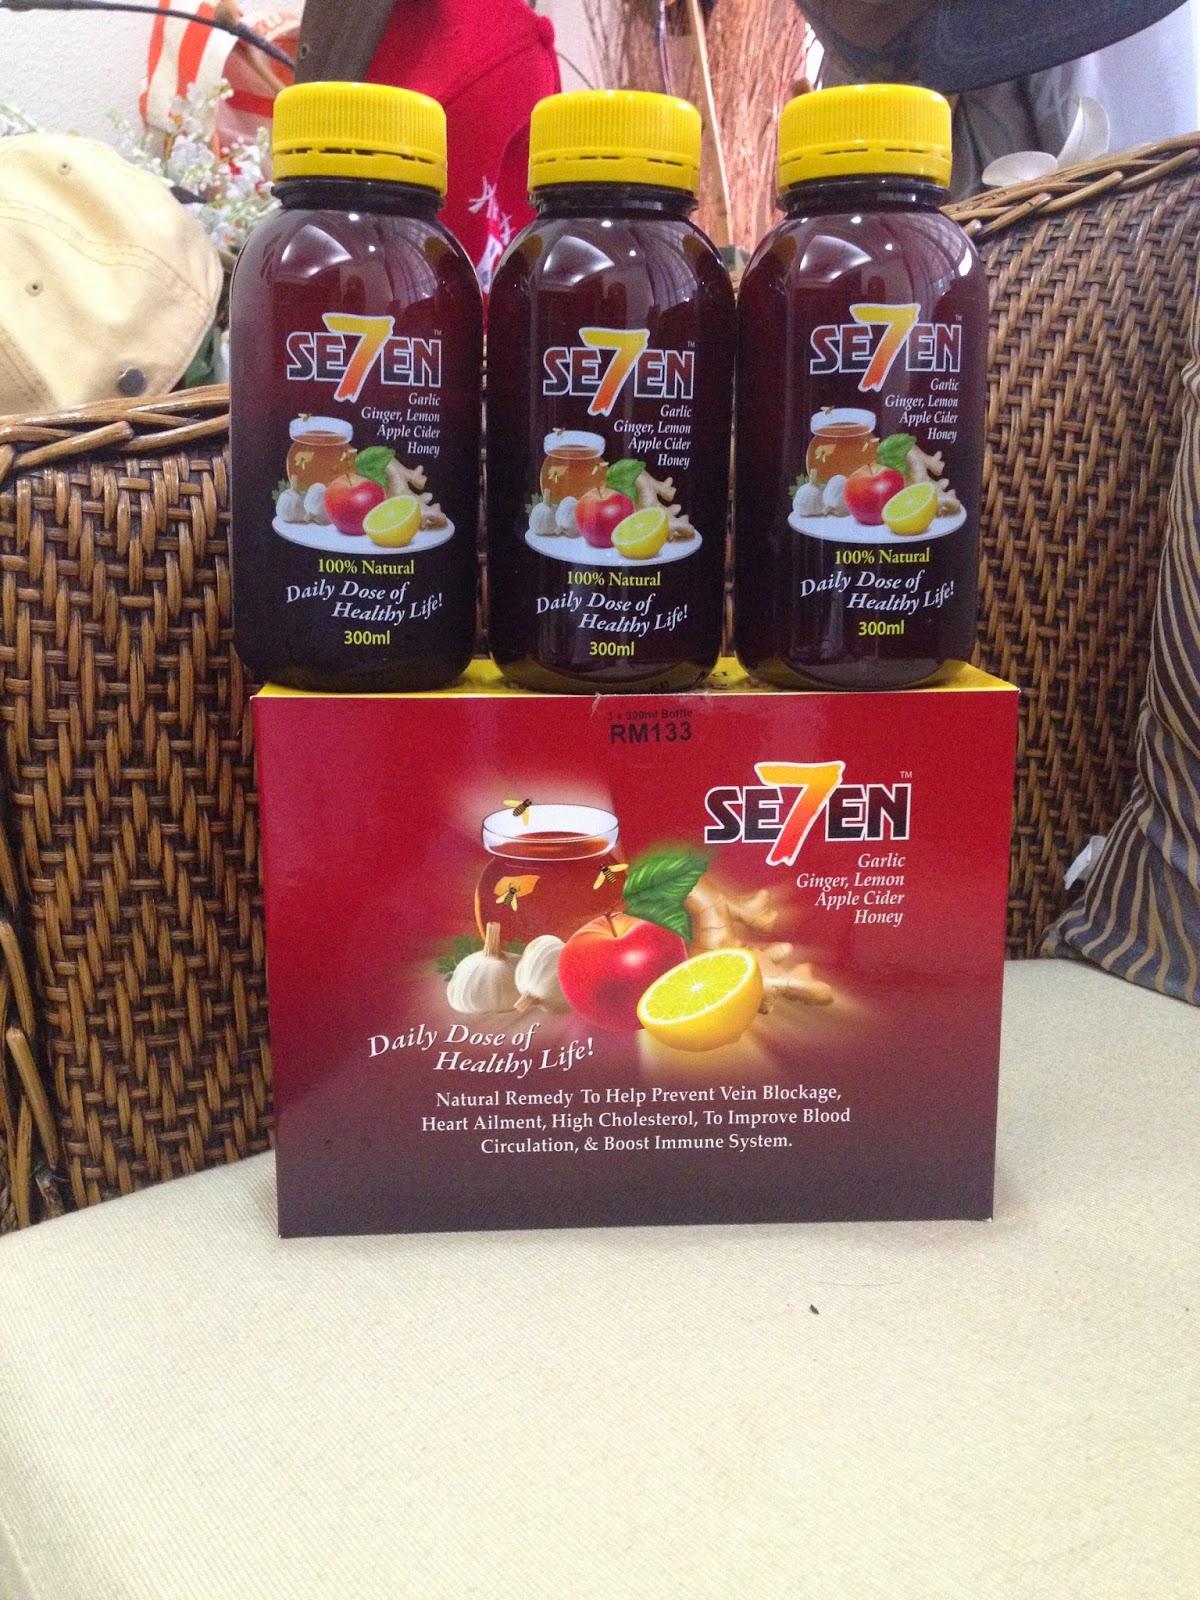 Se7en - halia, bawang putih, lemon, cuka epal dan madu